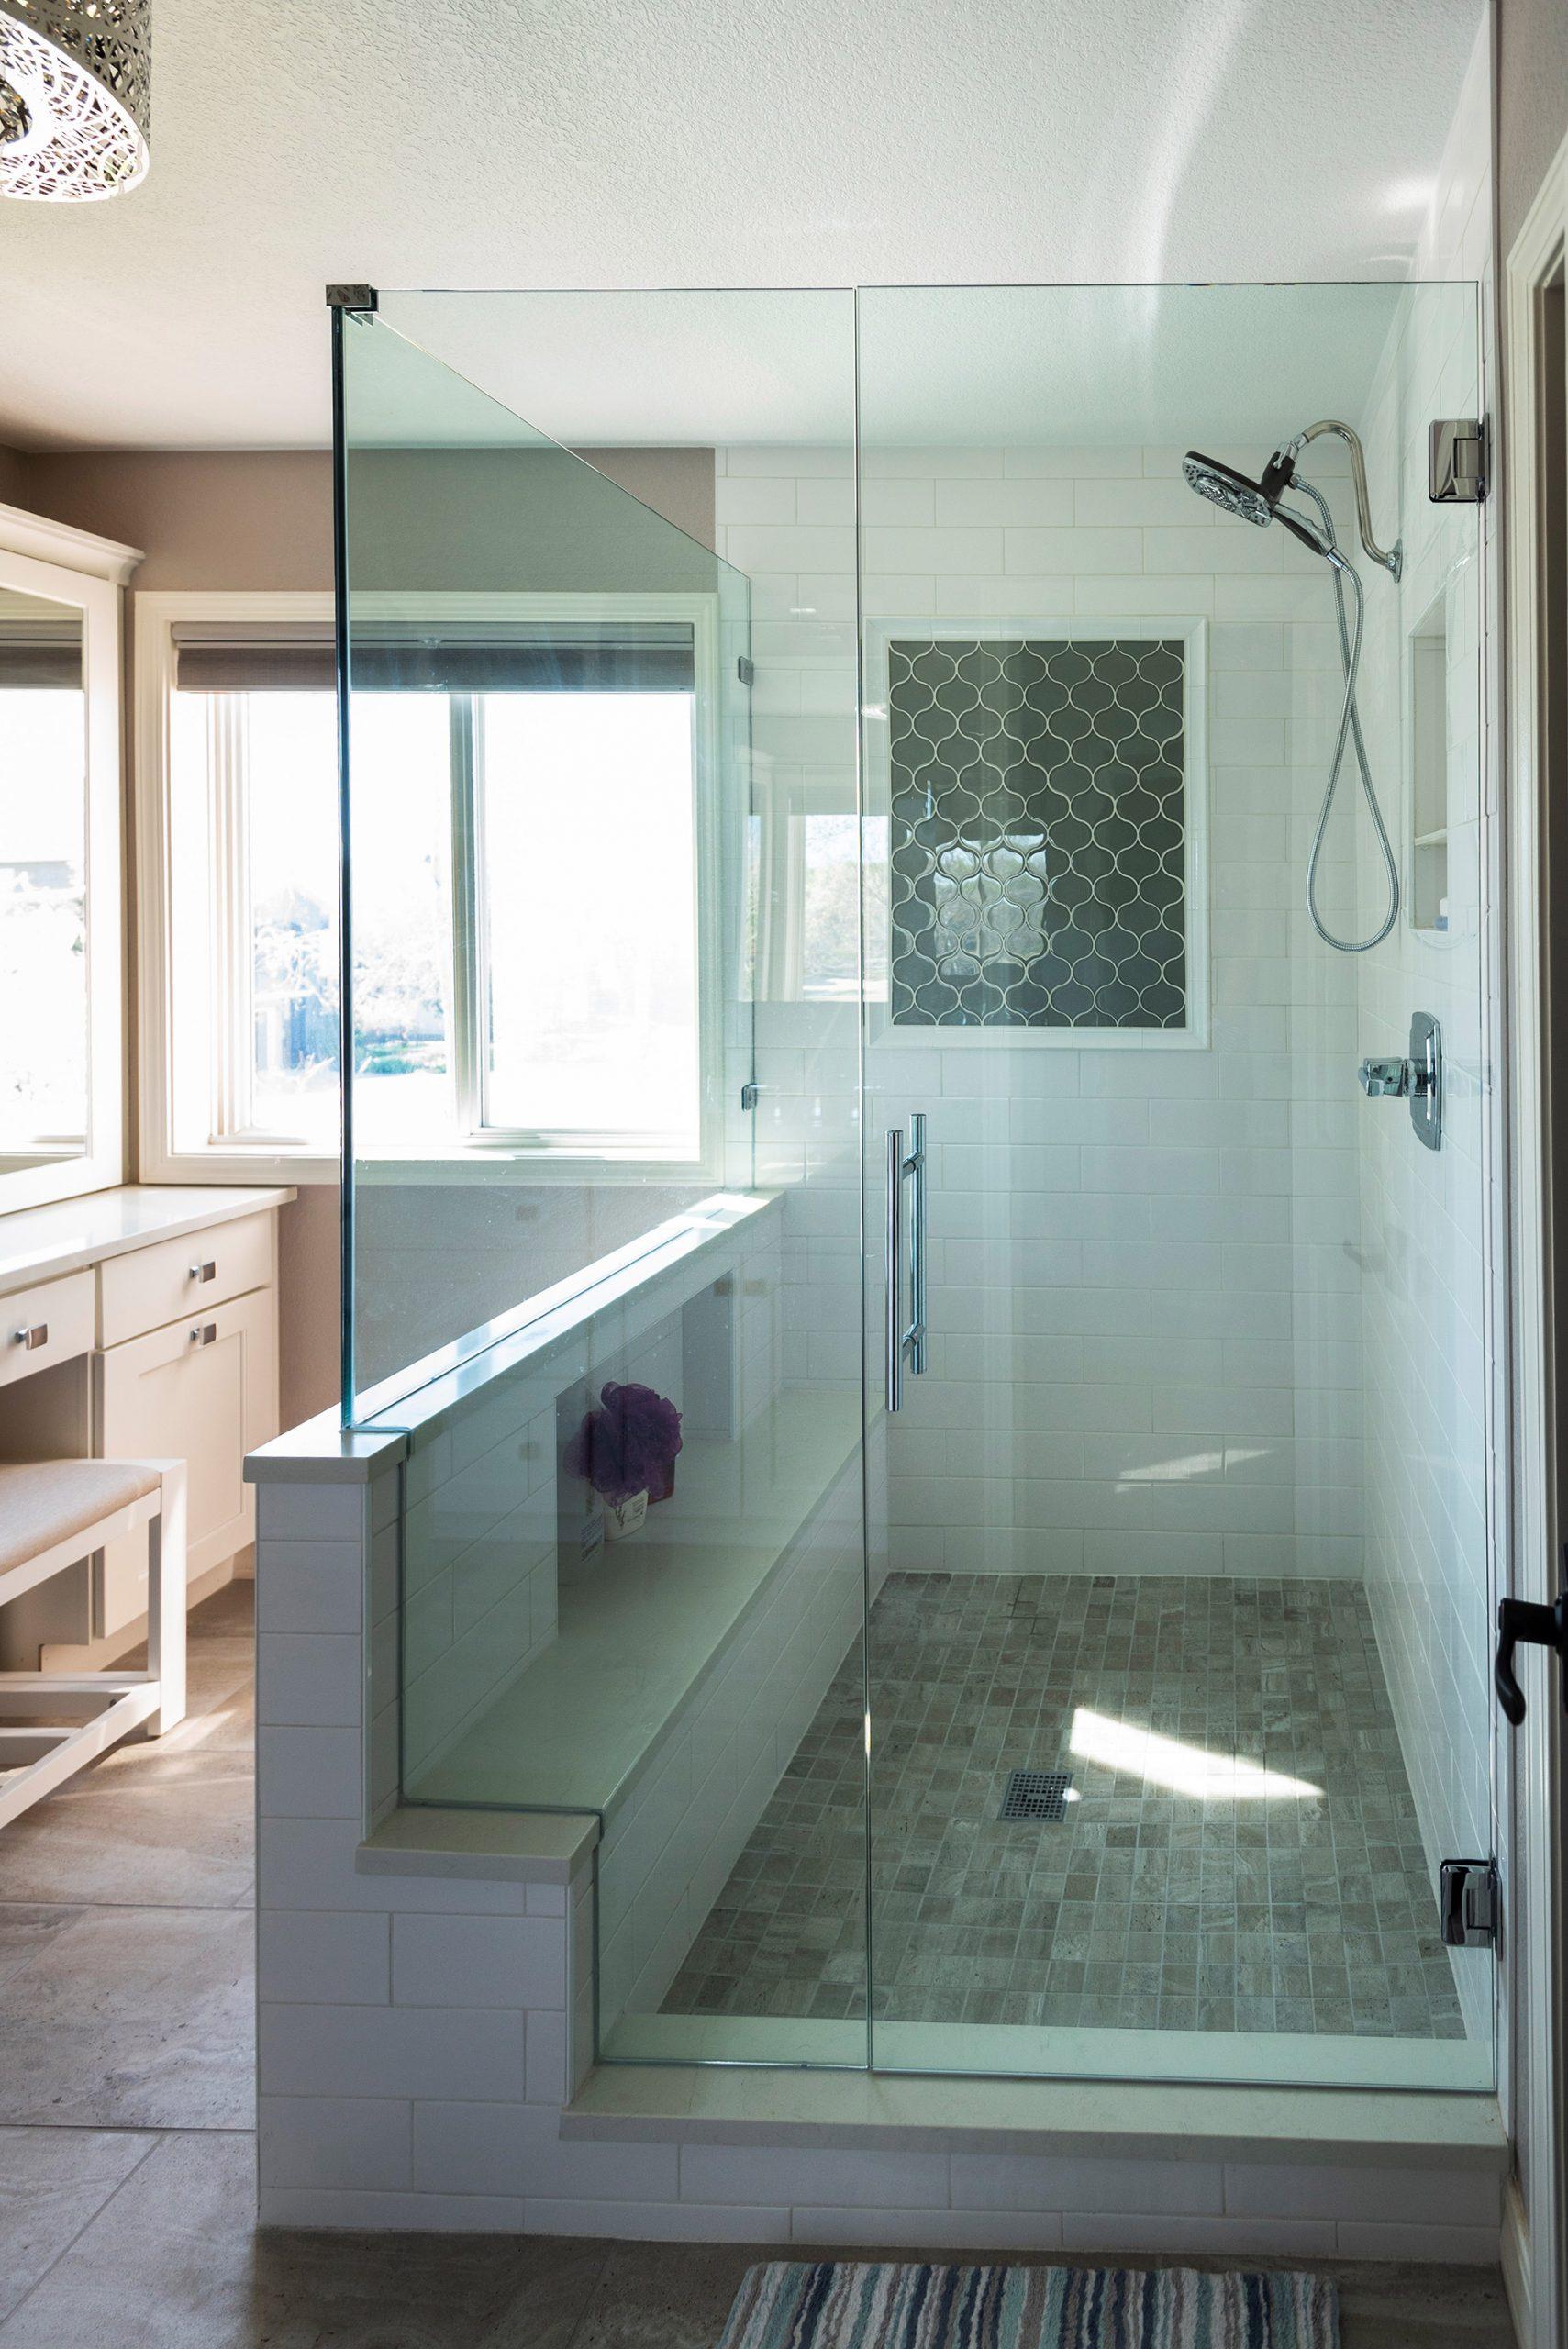 20190503_mccarty-bathroom-10-crop